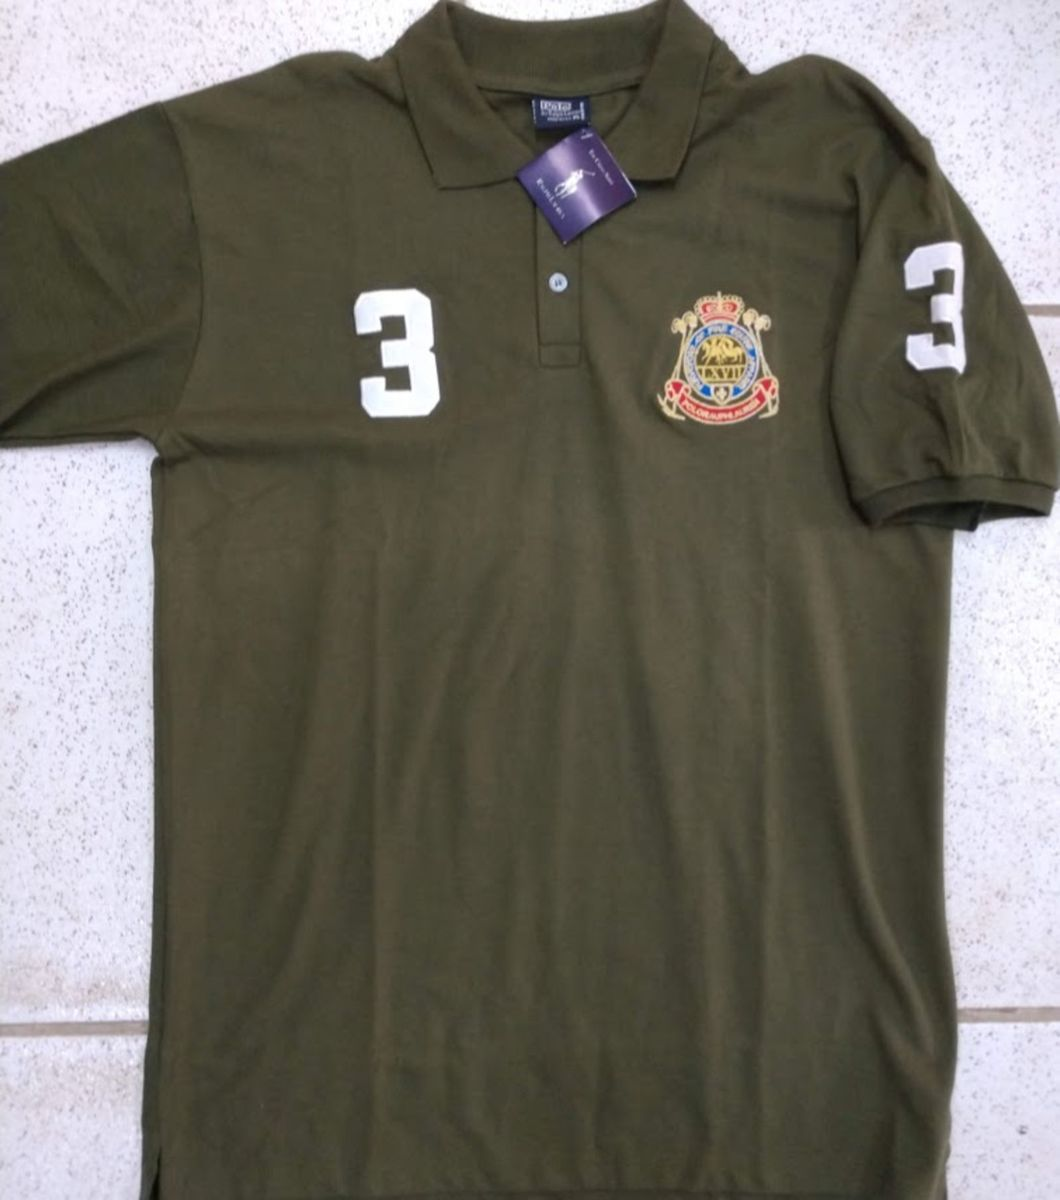 camisa polo ralph lauren verde equine tam gg - camisas polo ralph lauren dd3df67b879